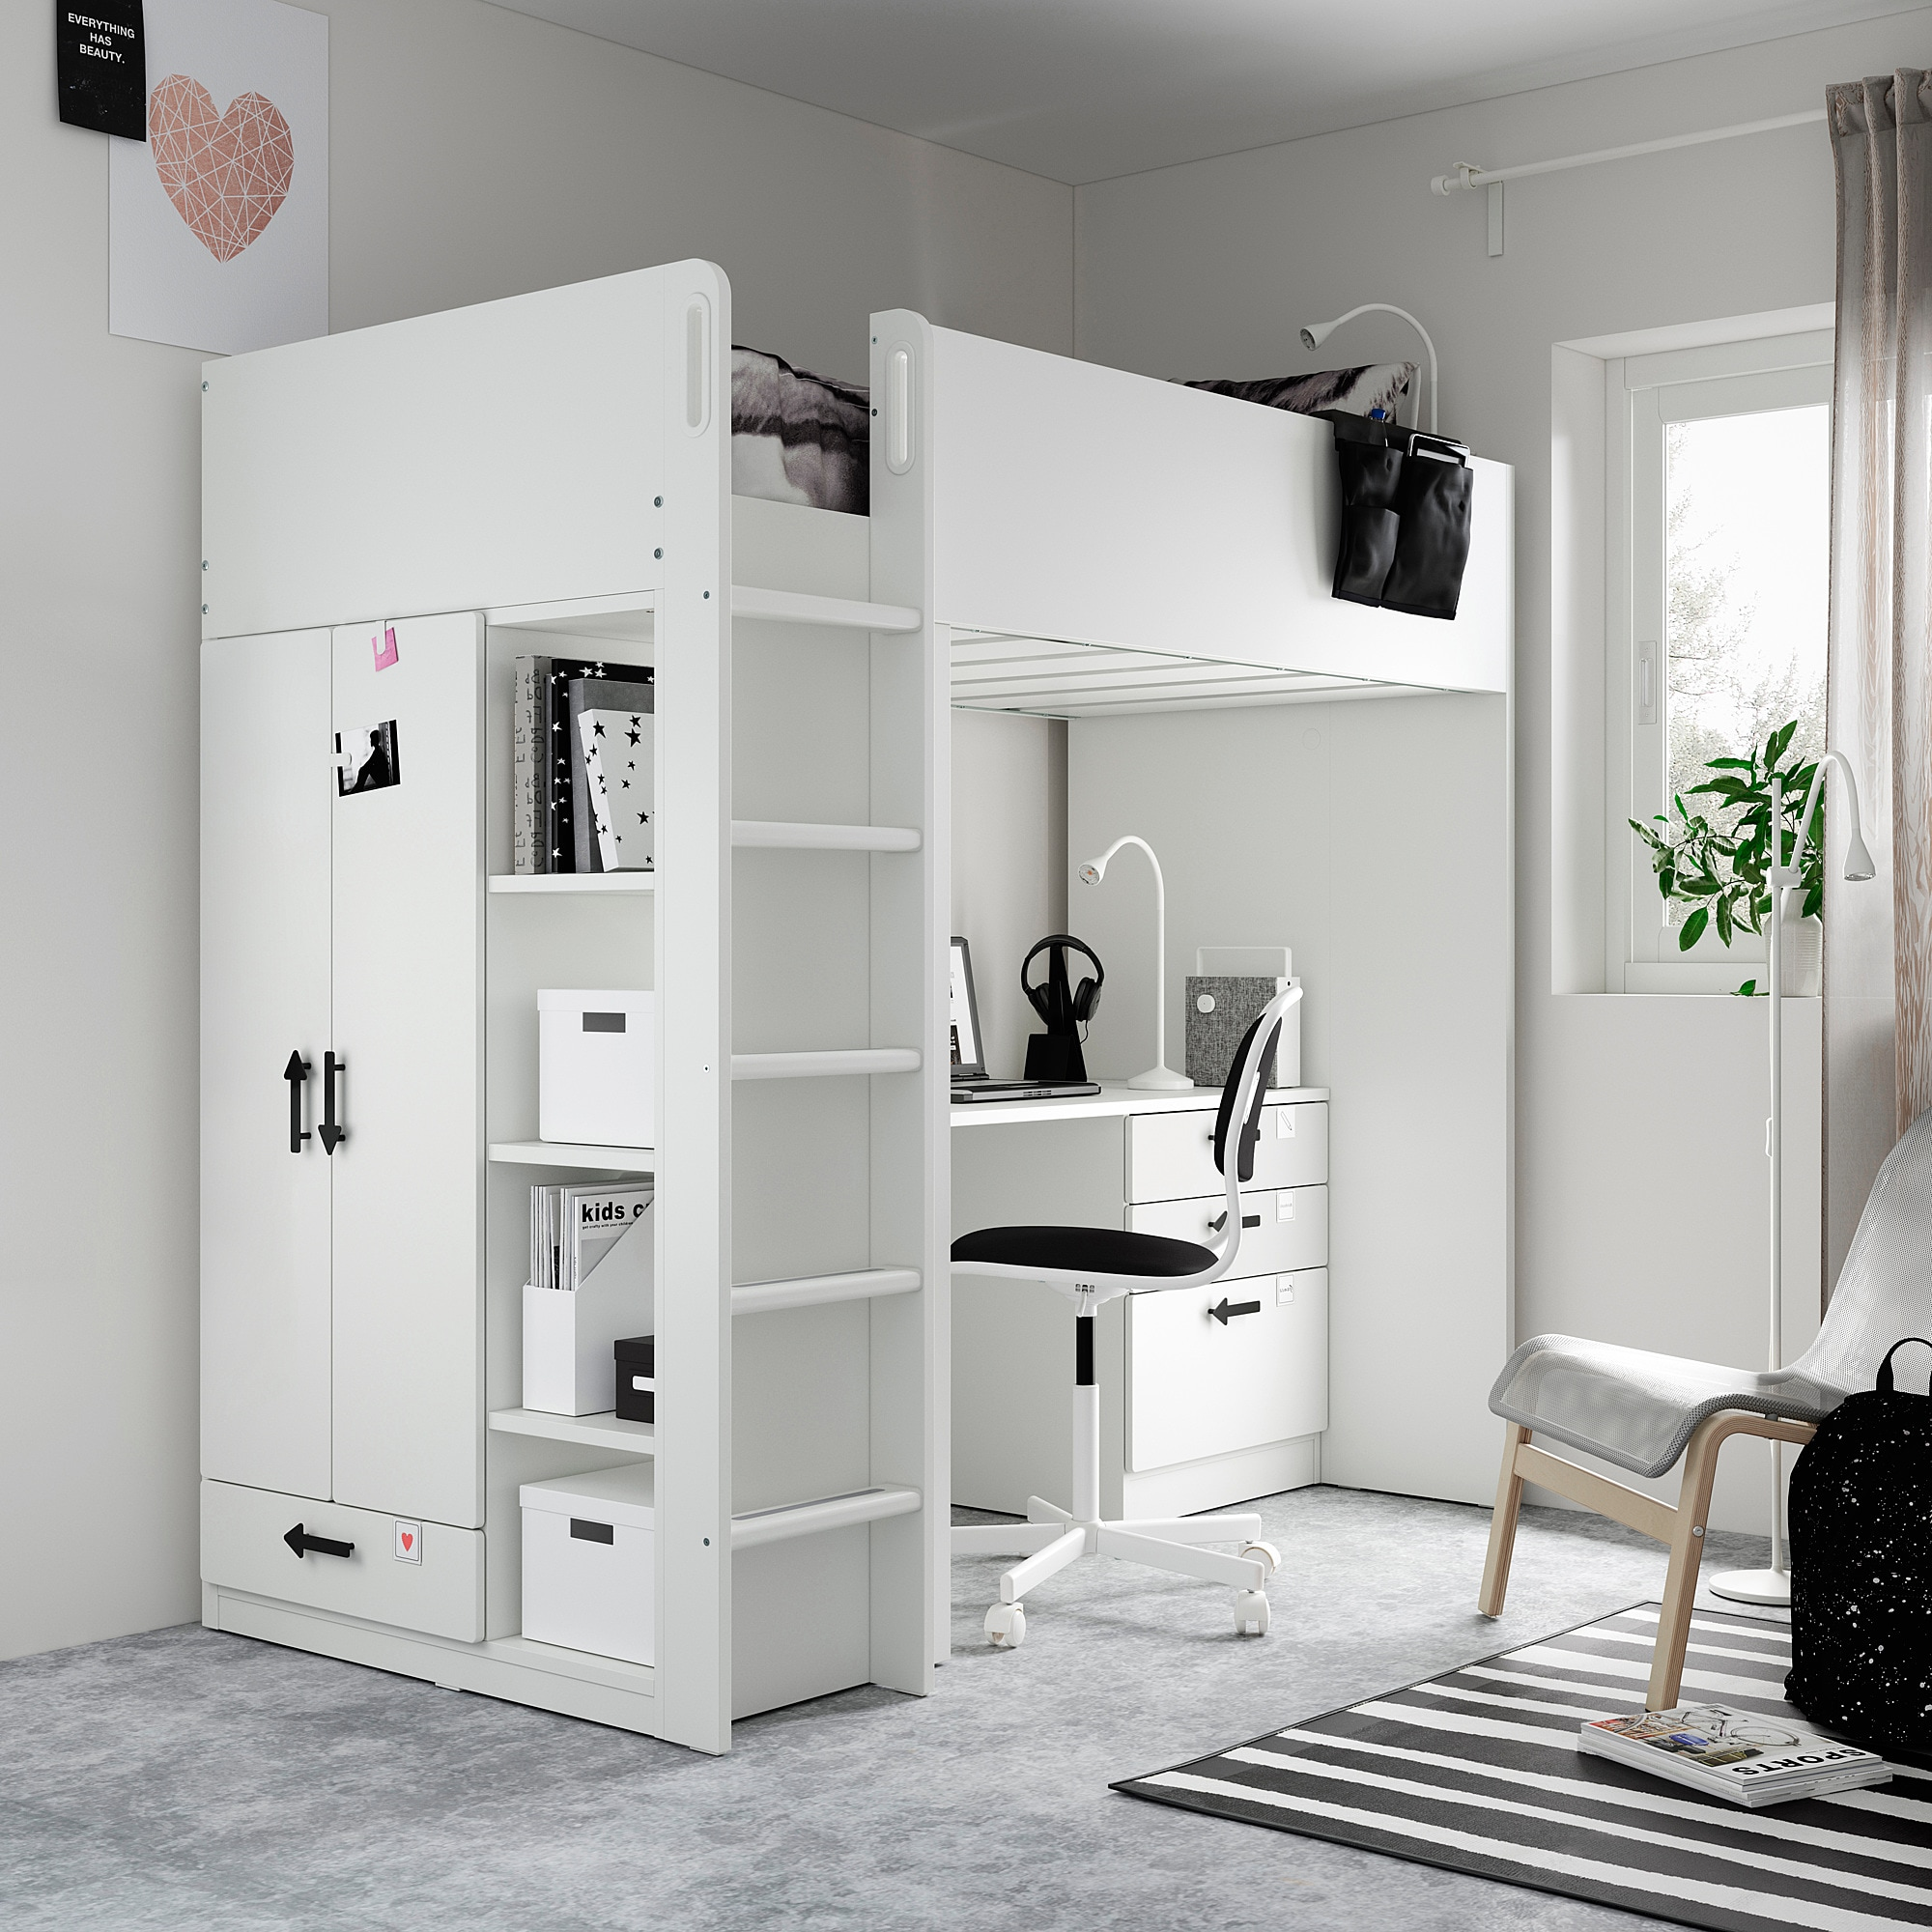 IKEA Kinderzimmer einrichten Smastad Multifunktionsbett